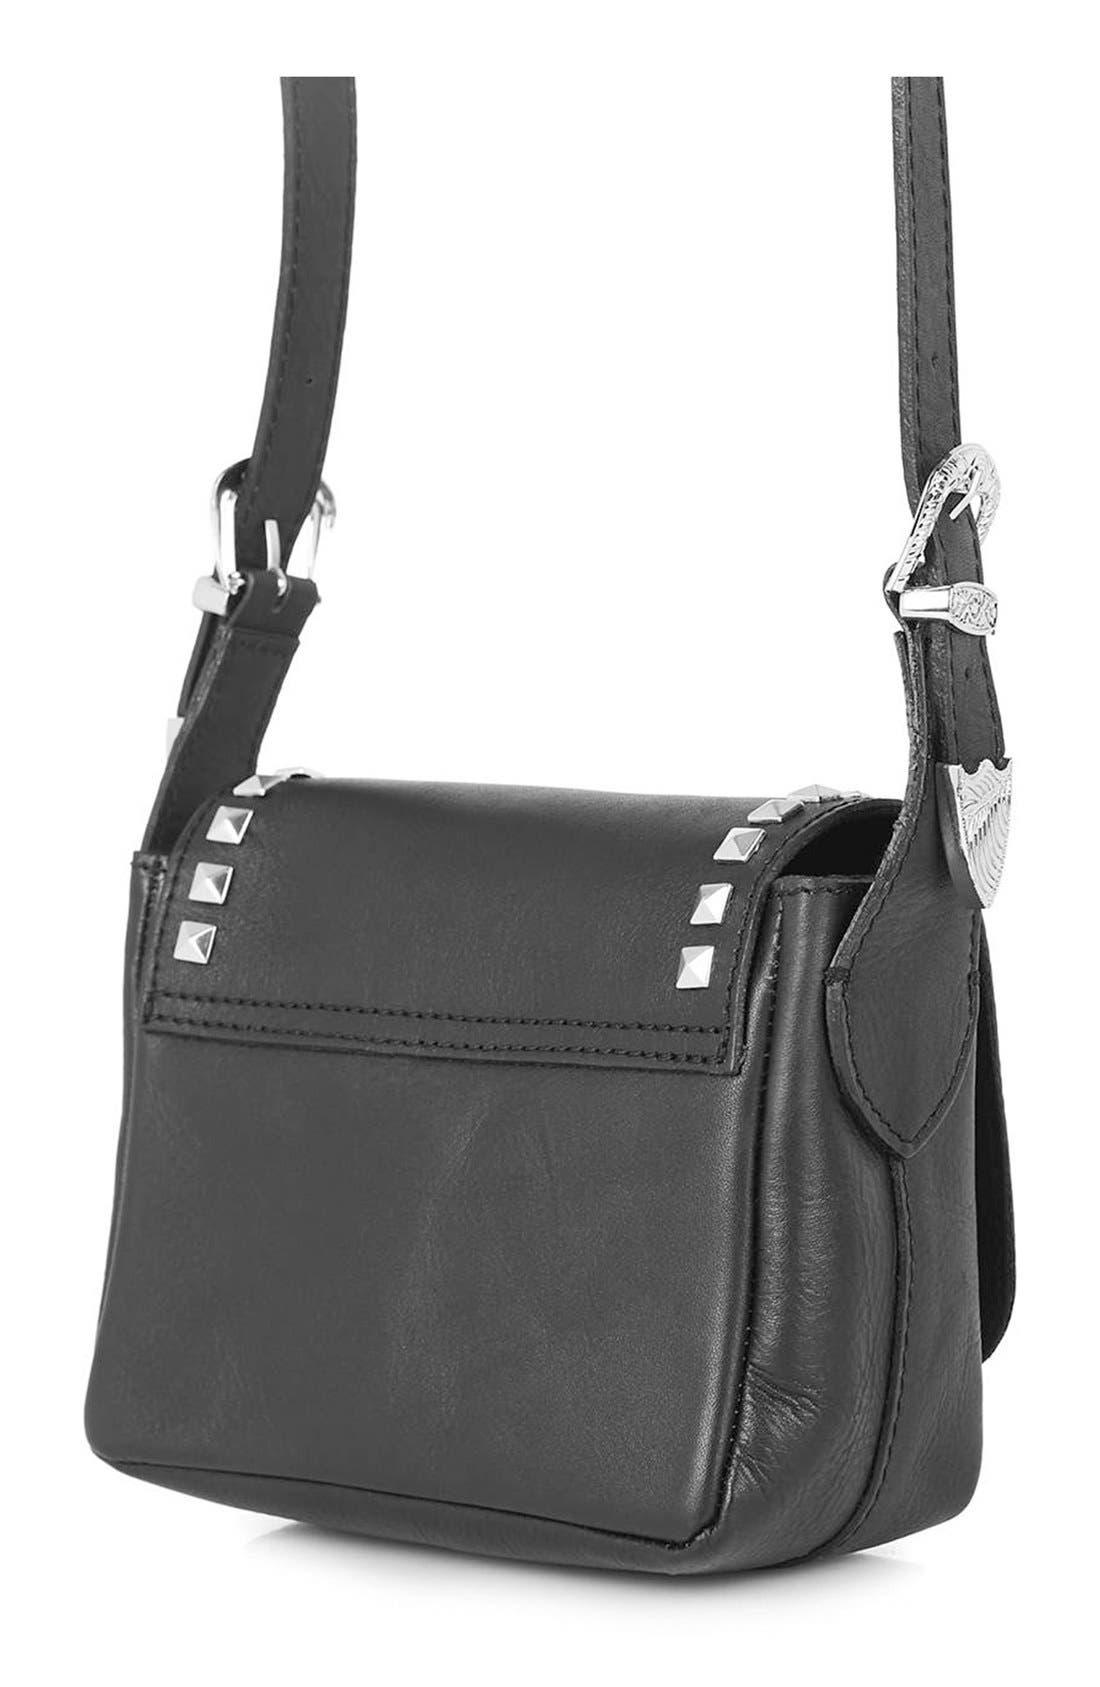 Alternate Image 3  - Topshop 'Rodeo' Studded Leather Crossbody Bag